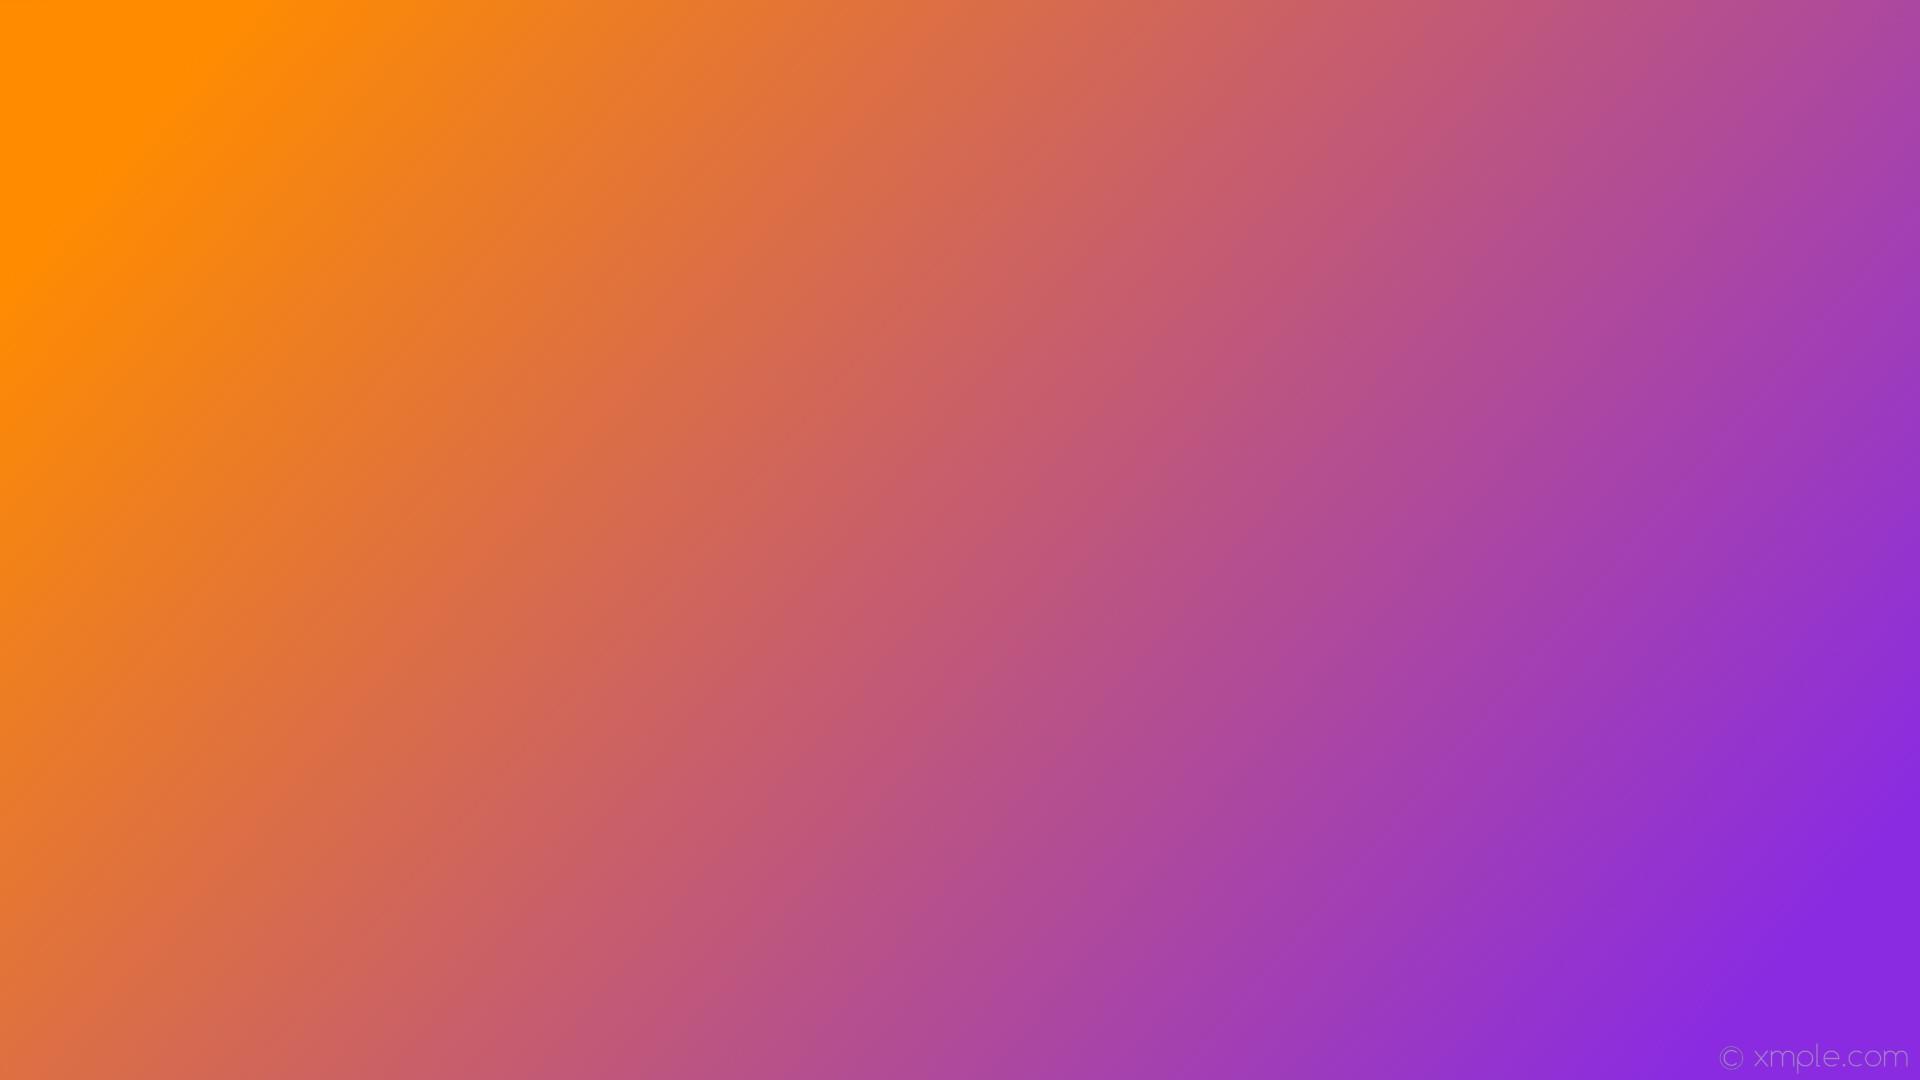 wallpaper linear orange gradient purple dark orange blue violet #ff8c00  #8a2be2 165°